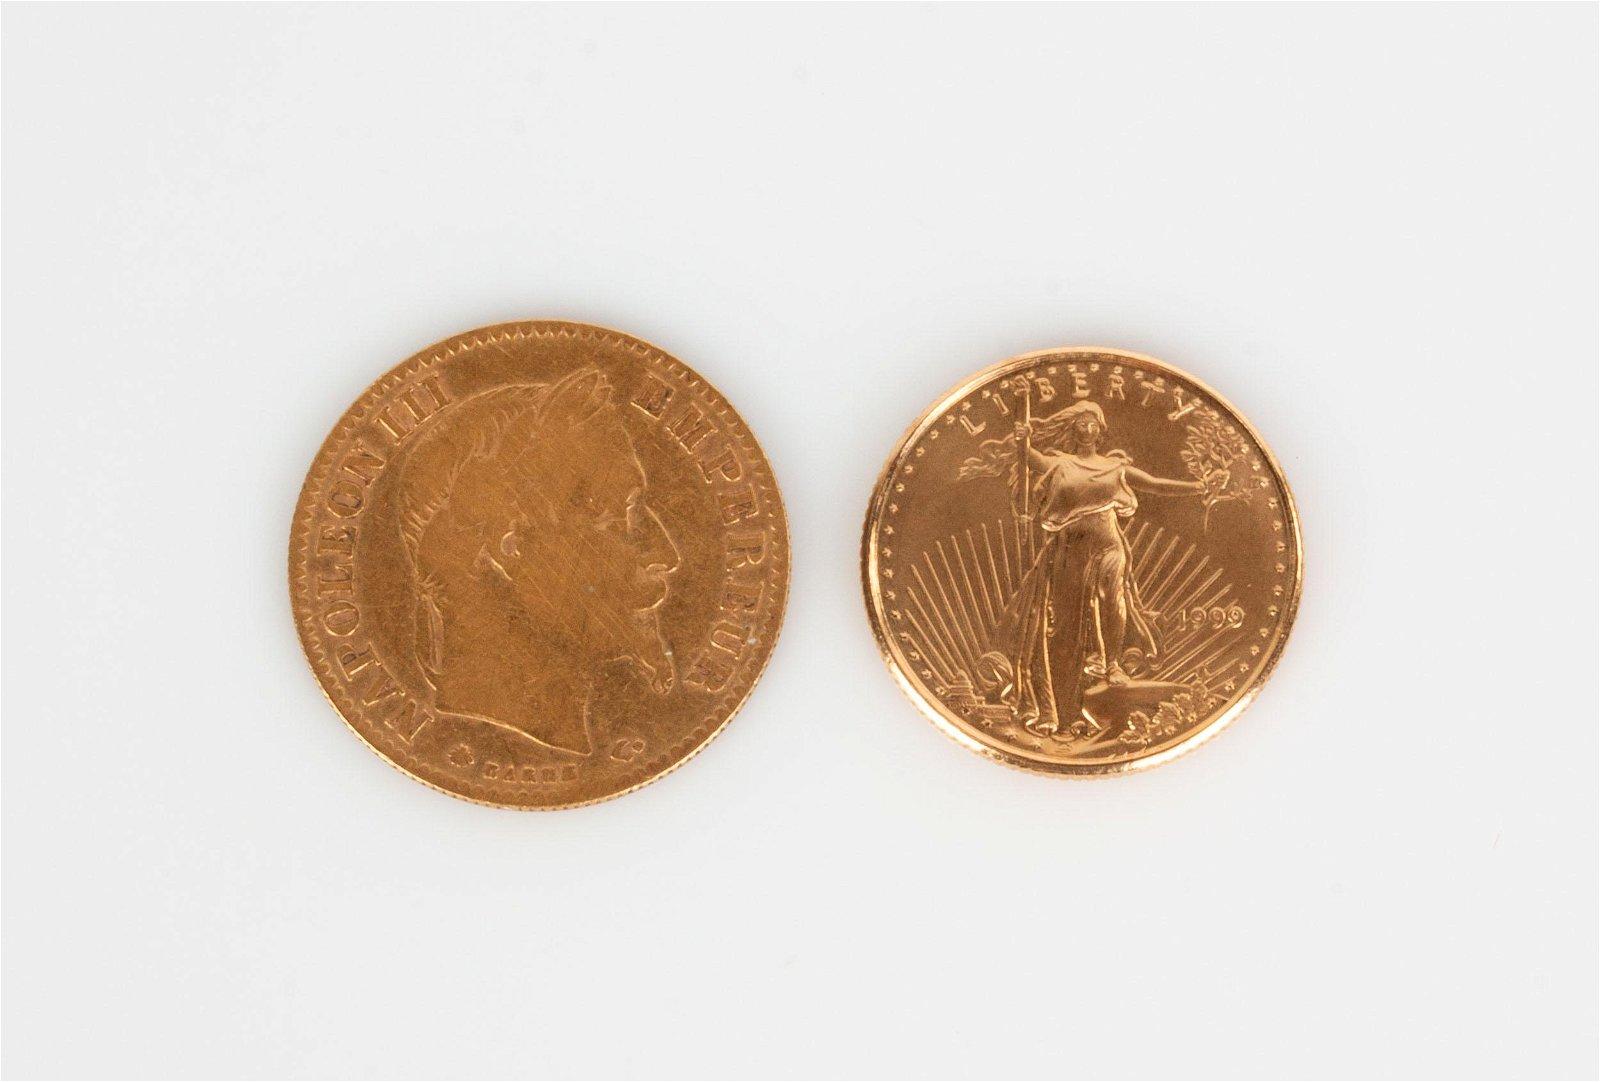 1866 Napoleon III 10 Francs & 1999 American 5 Dollar